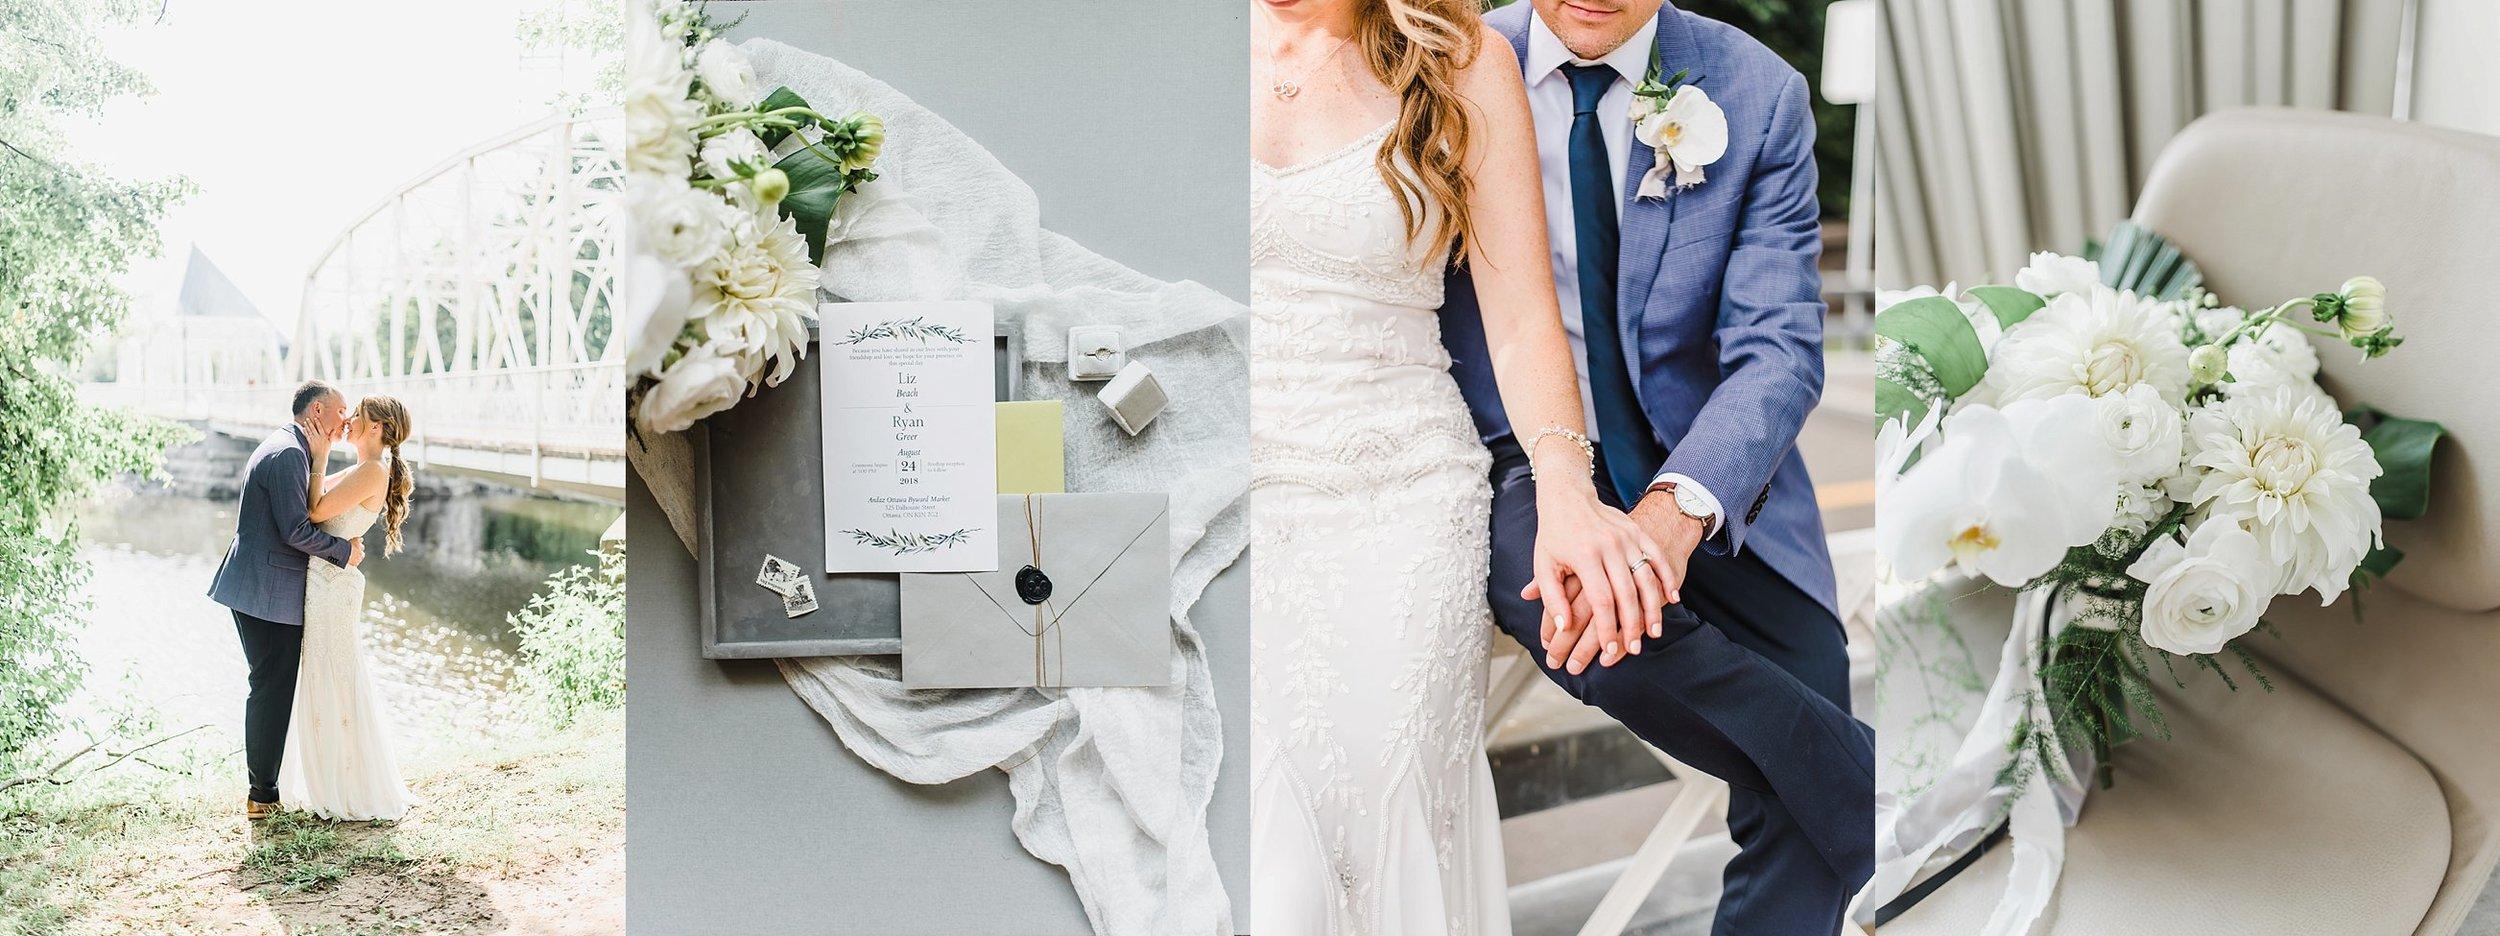 light airy indie fine art ottawa wedding photographer | Ali and Batoul Photography_0718.jpg